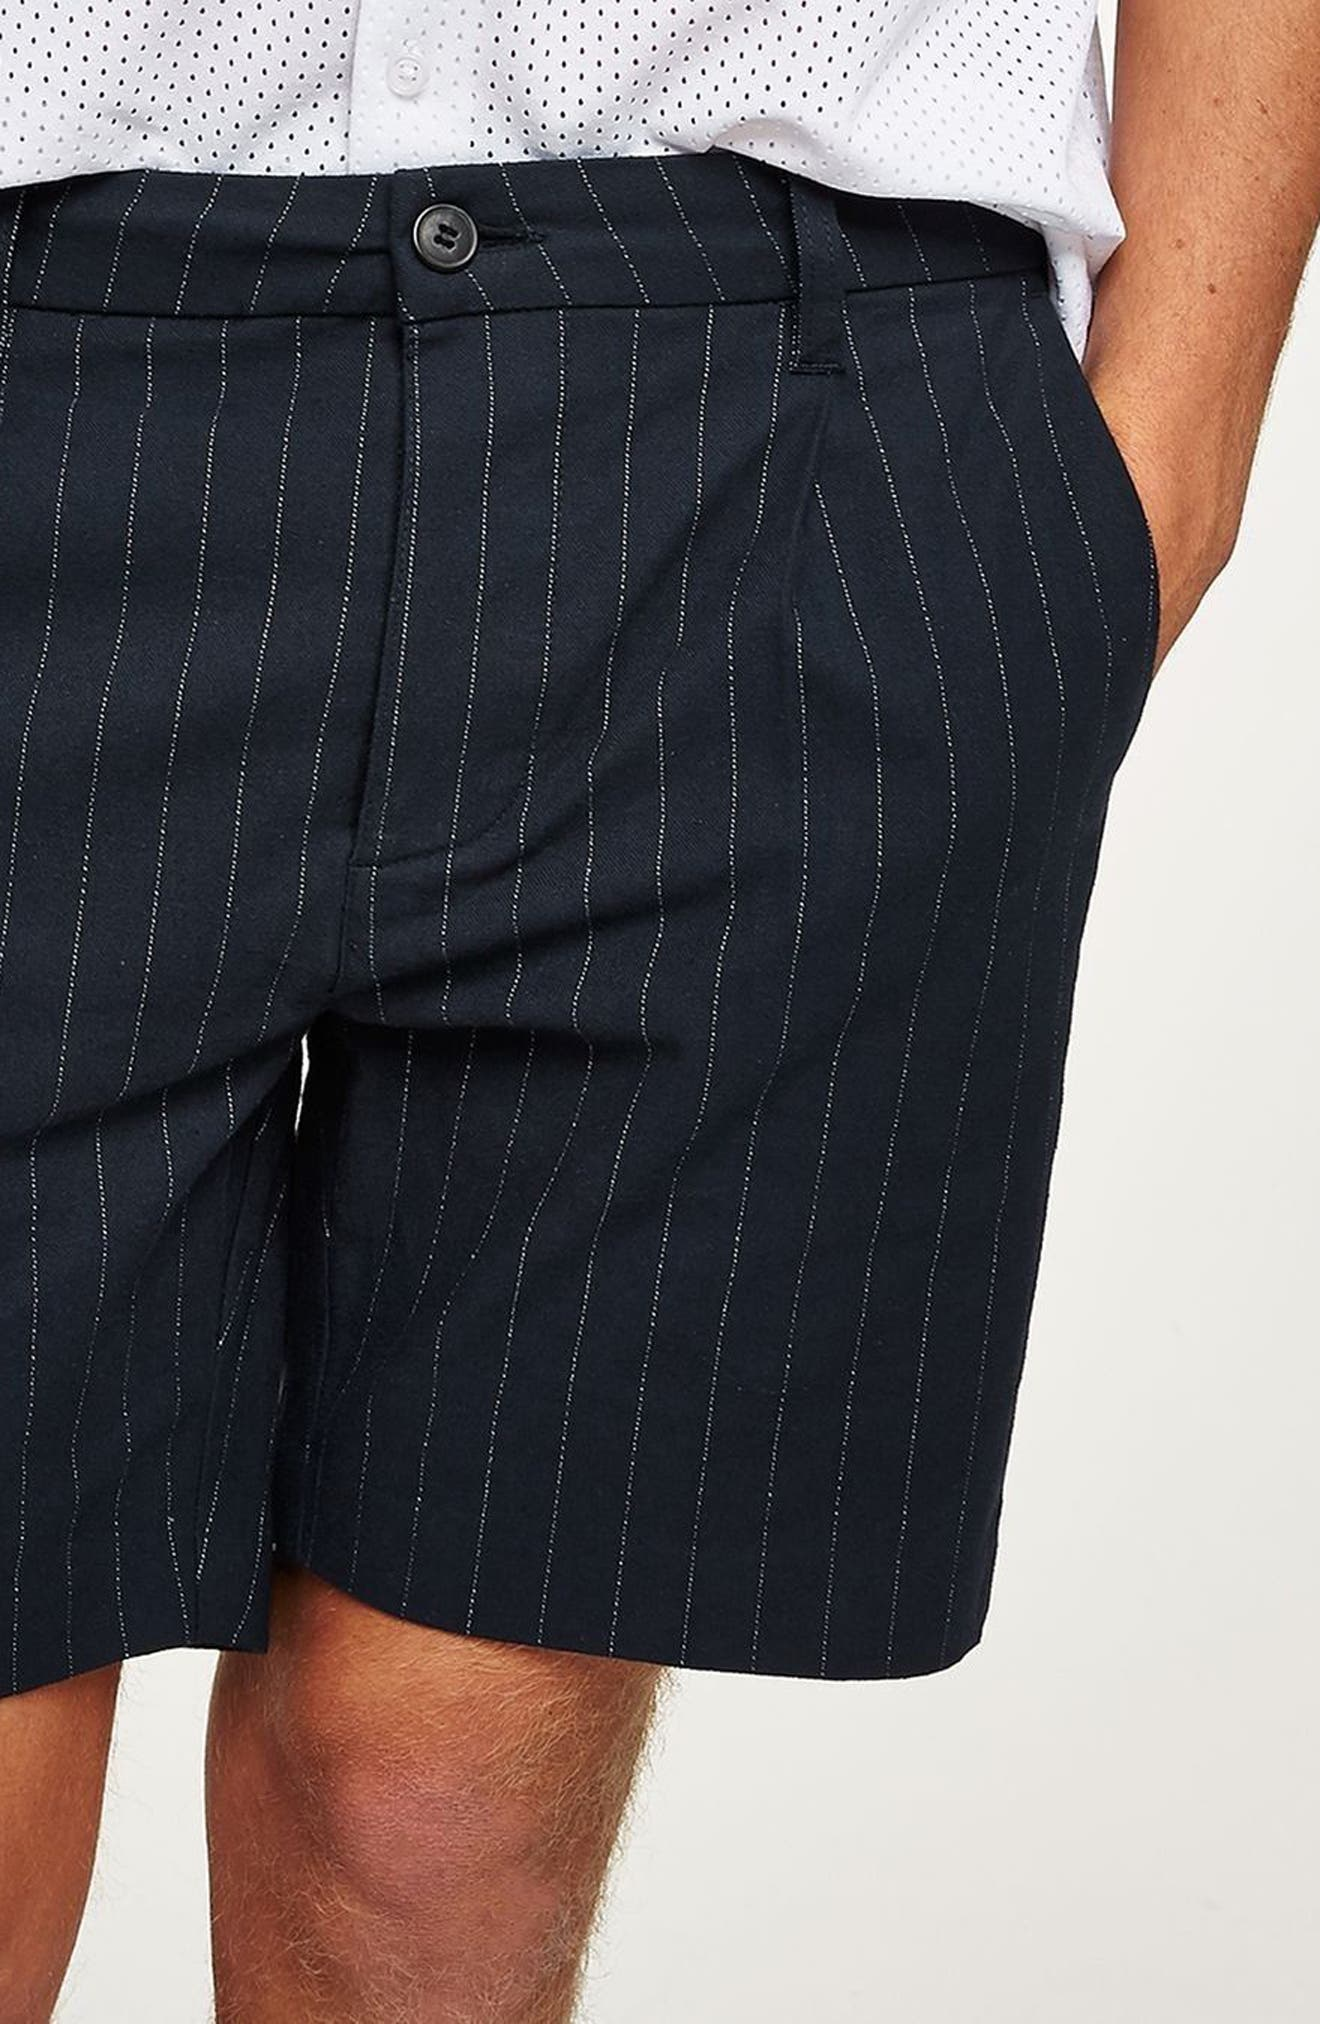 Pinstripe Shorts,                             Alternate thumbnail 3, color,                             NAVY BLUE